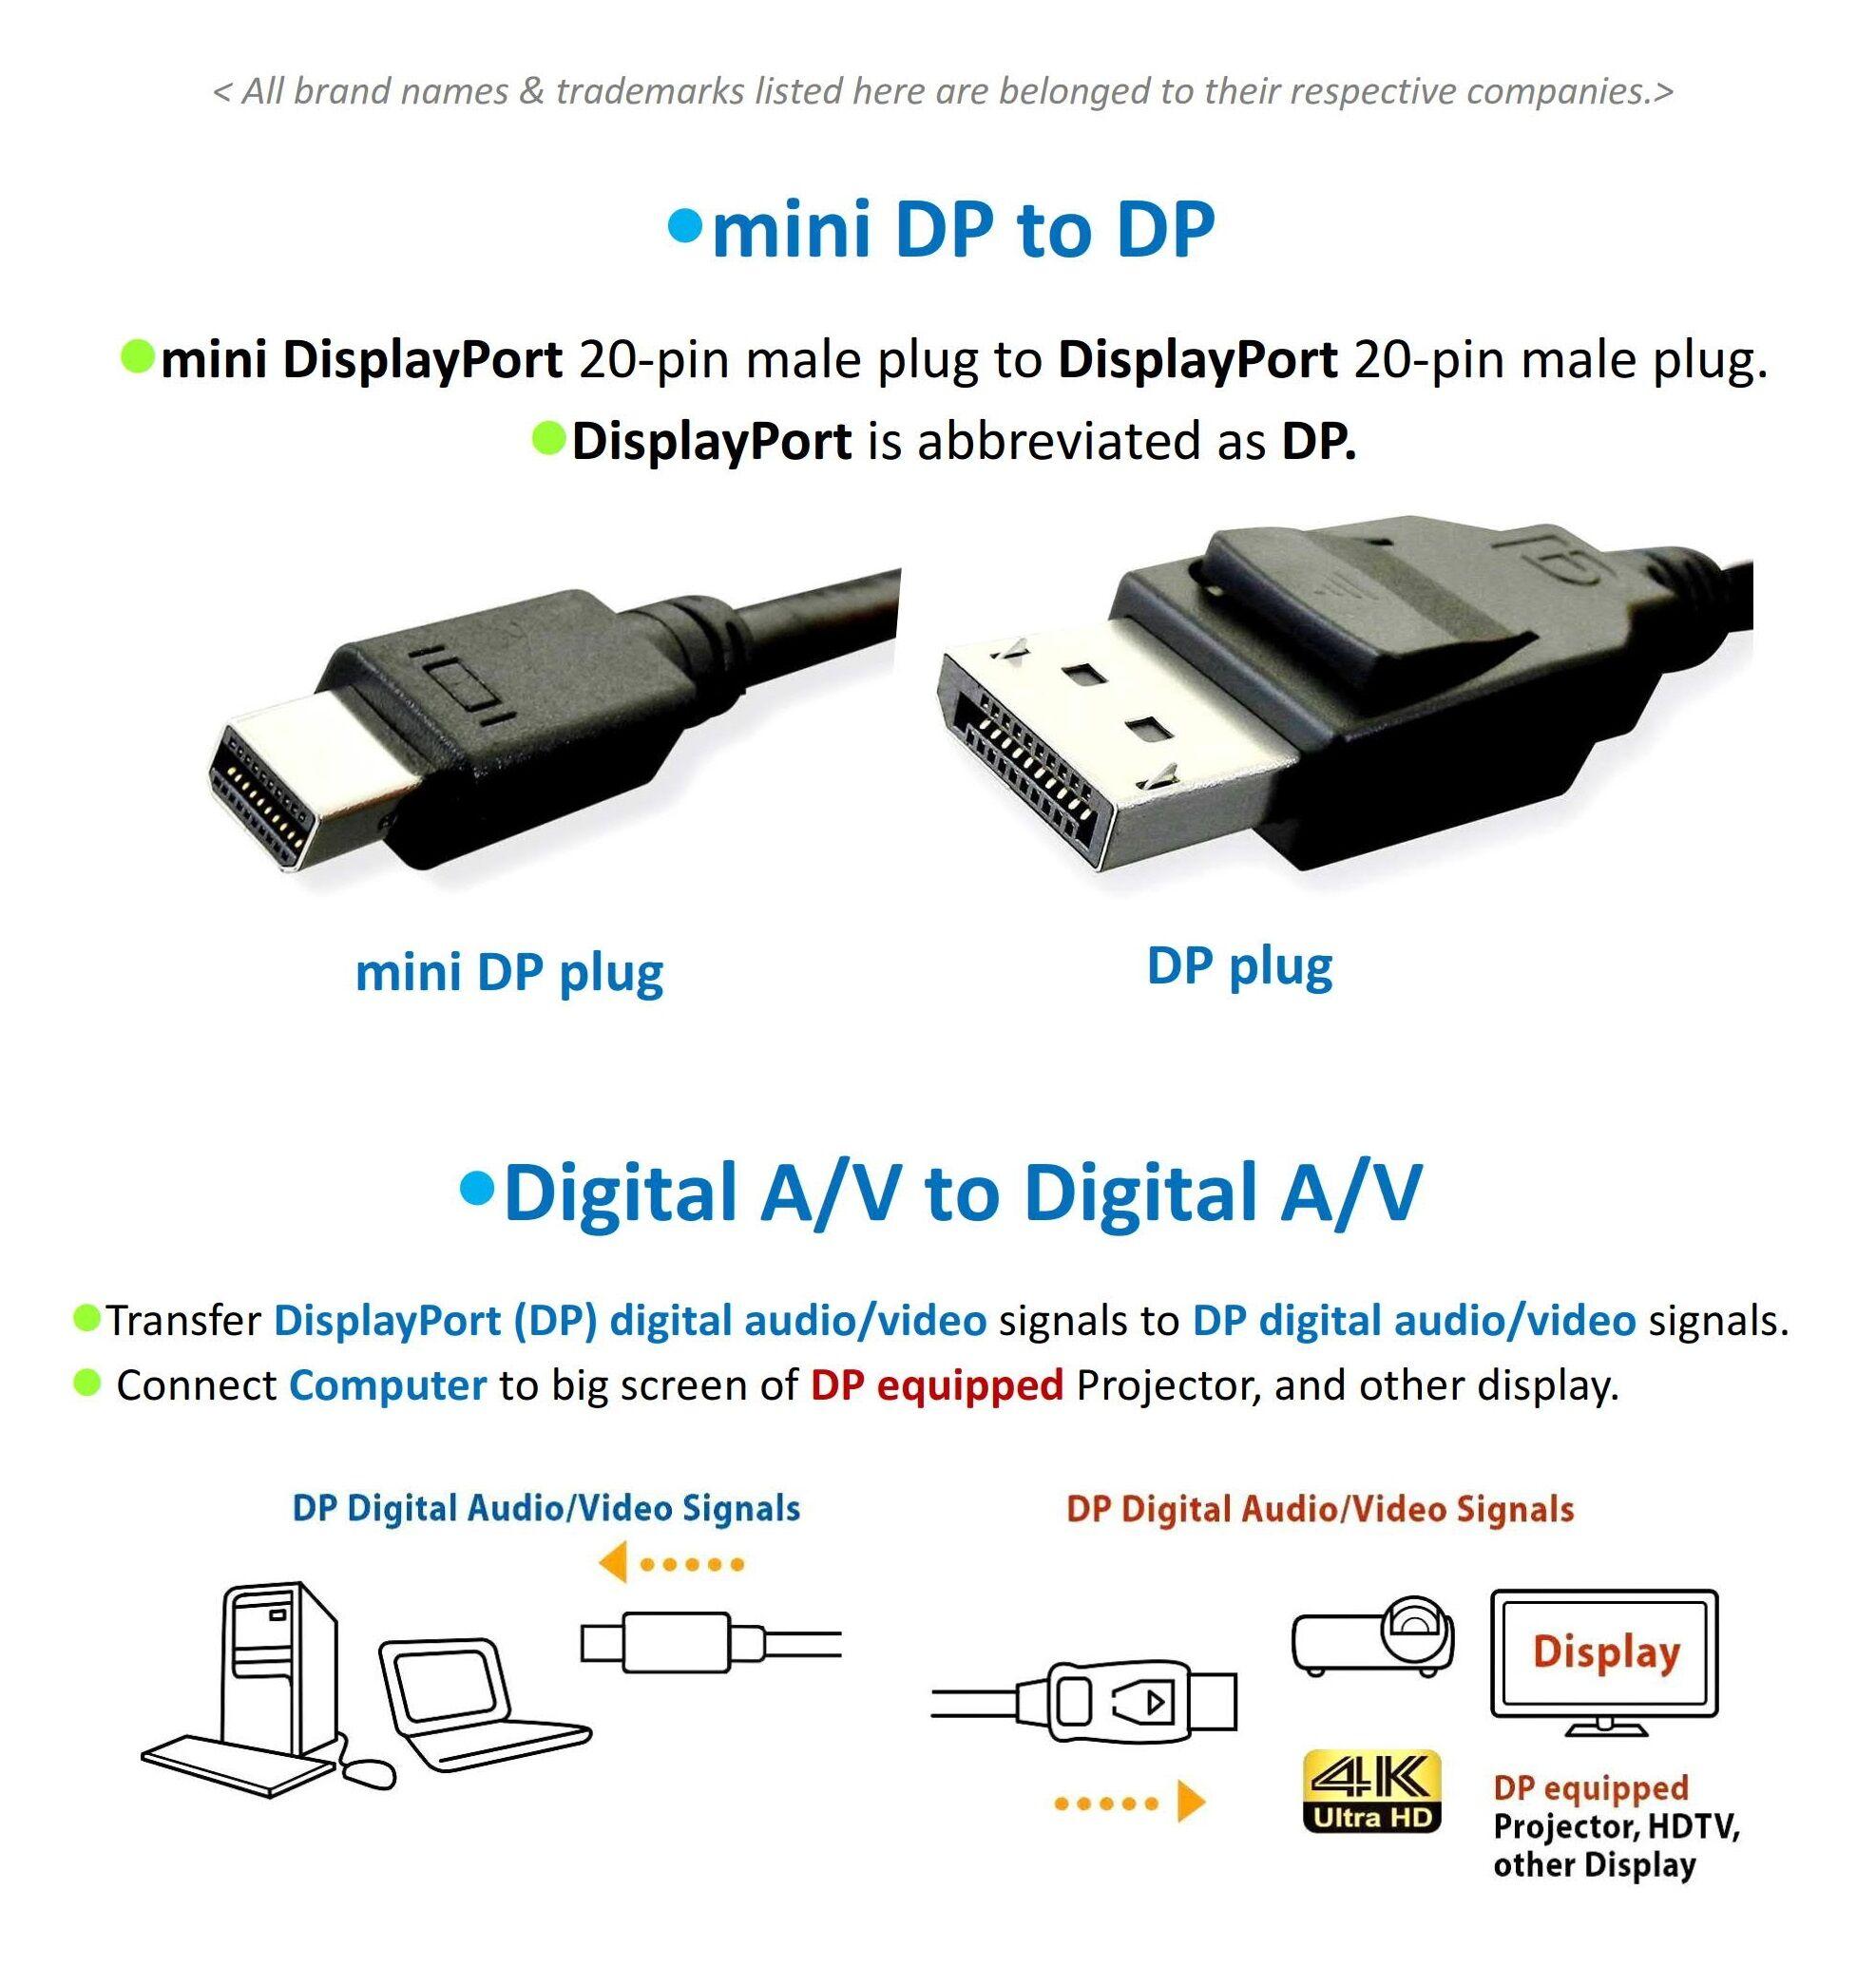 dpcm220s-11.jpeg